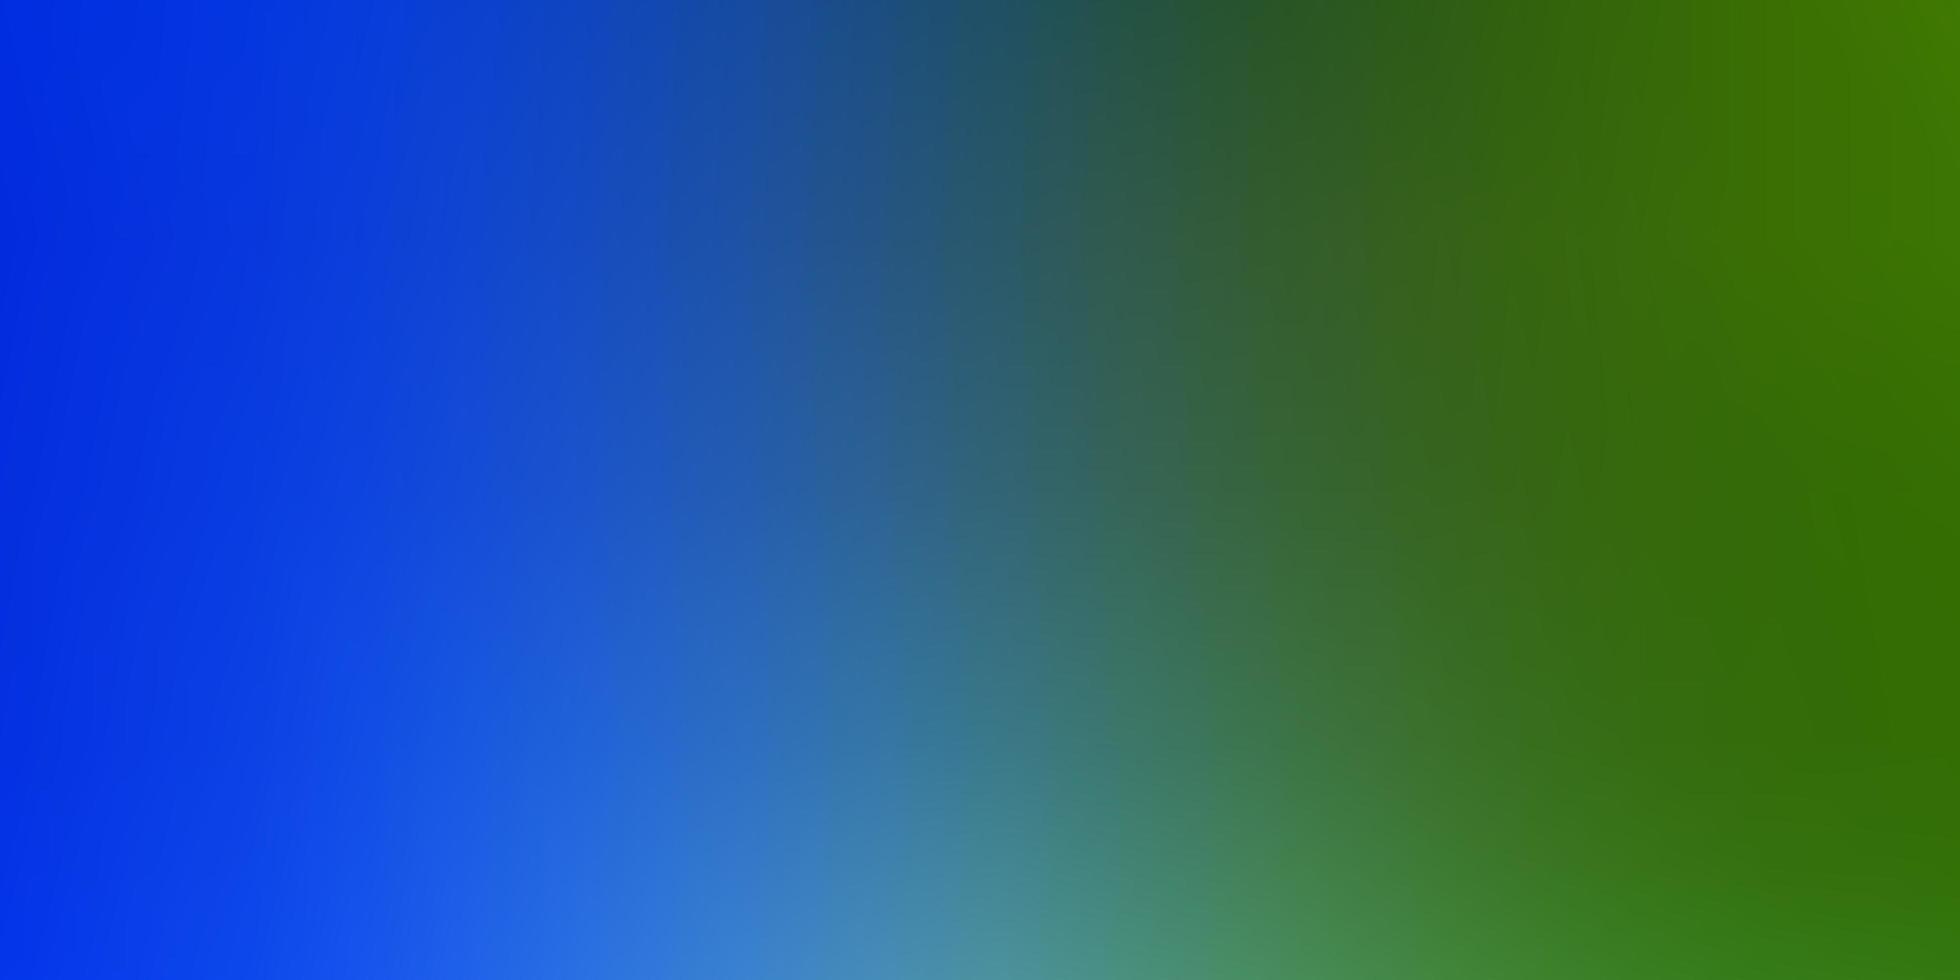 luz azul, verde vetor abstrato turva layout.